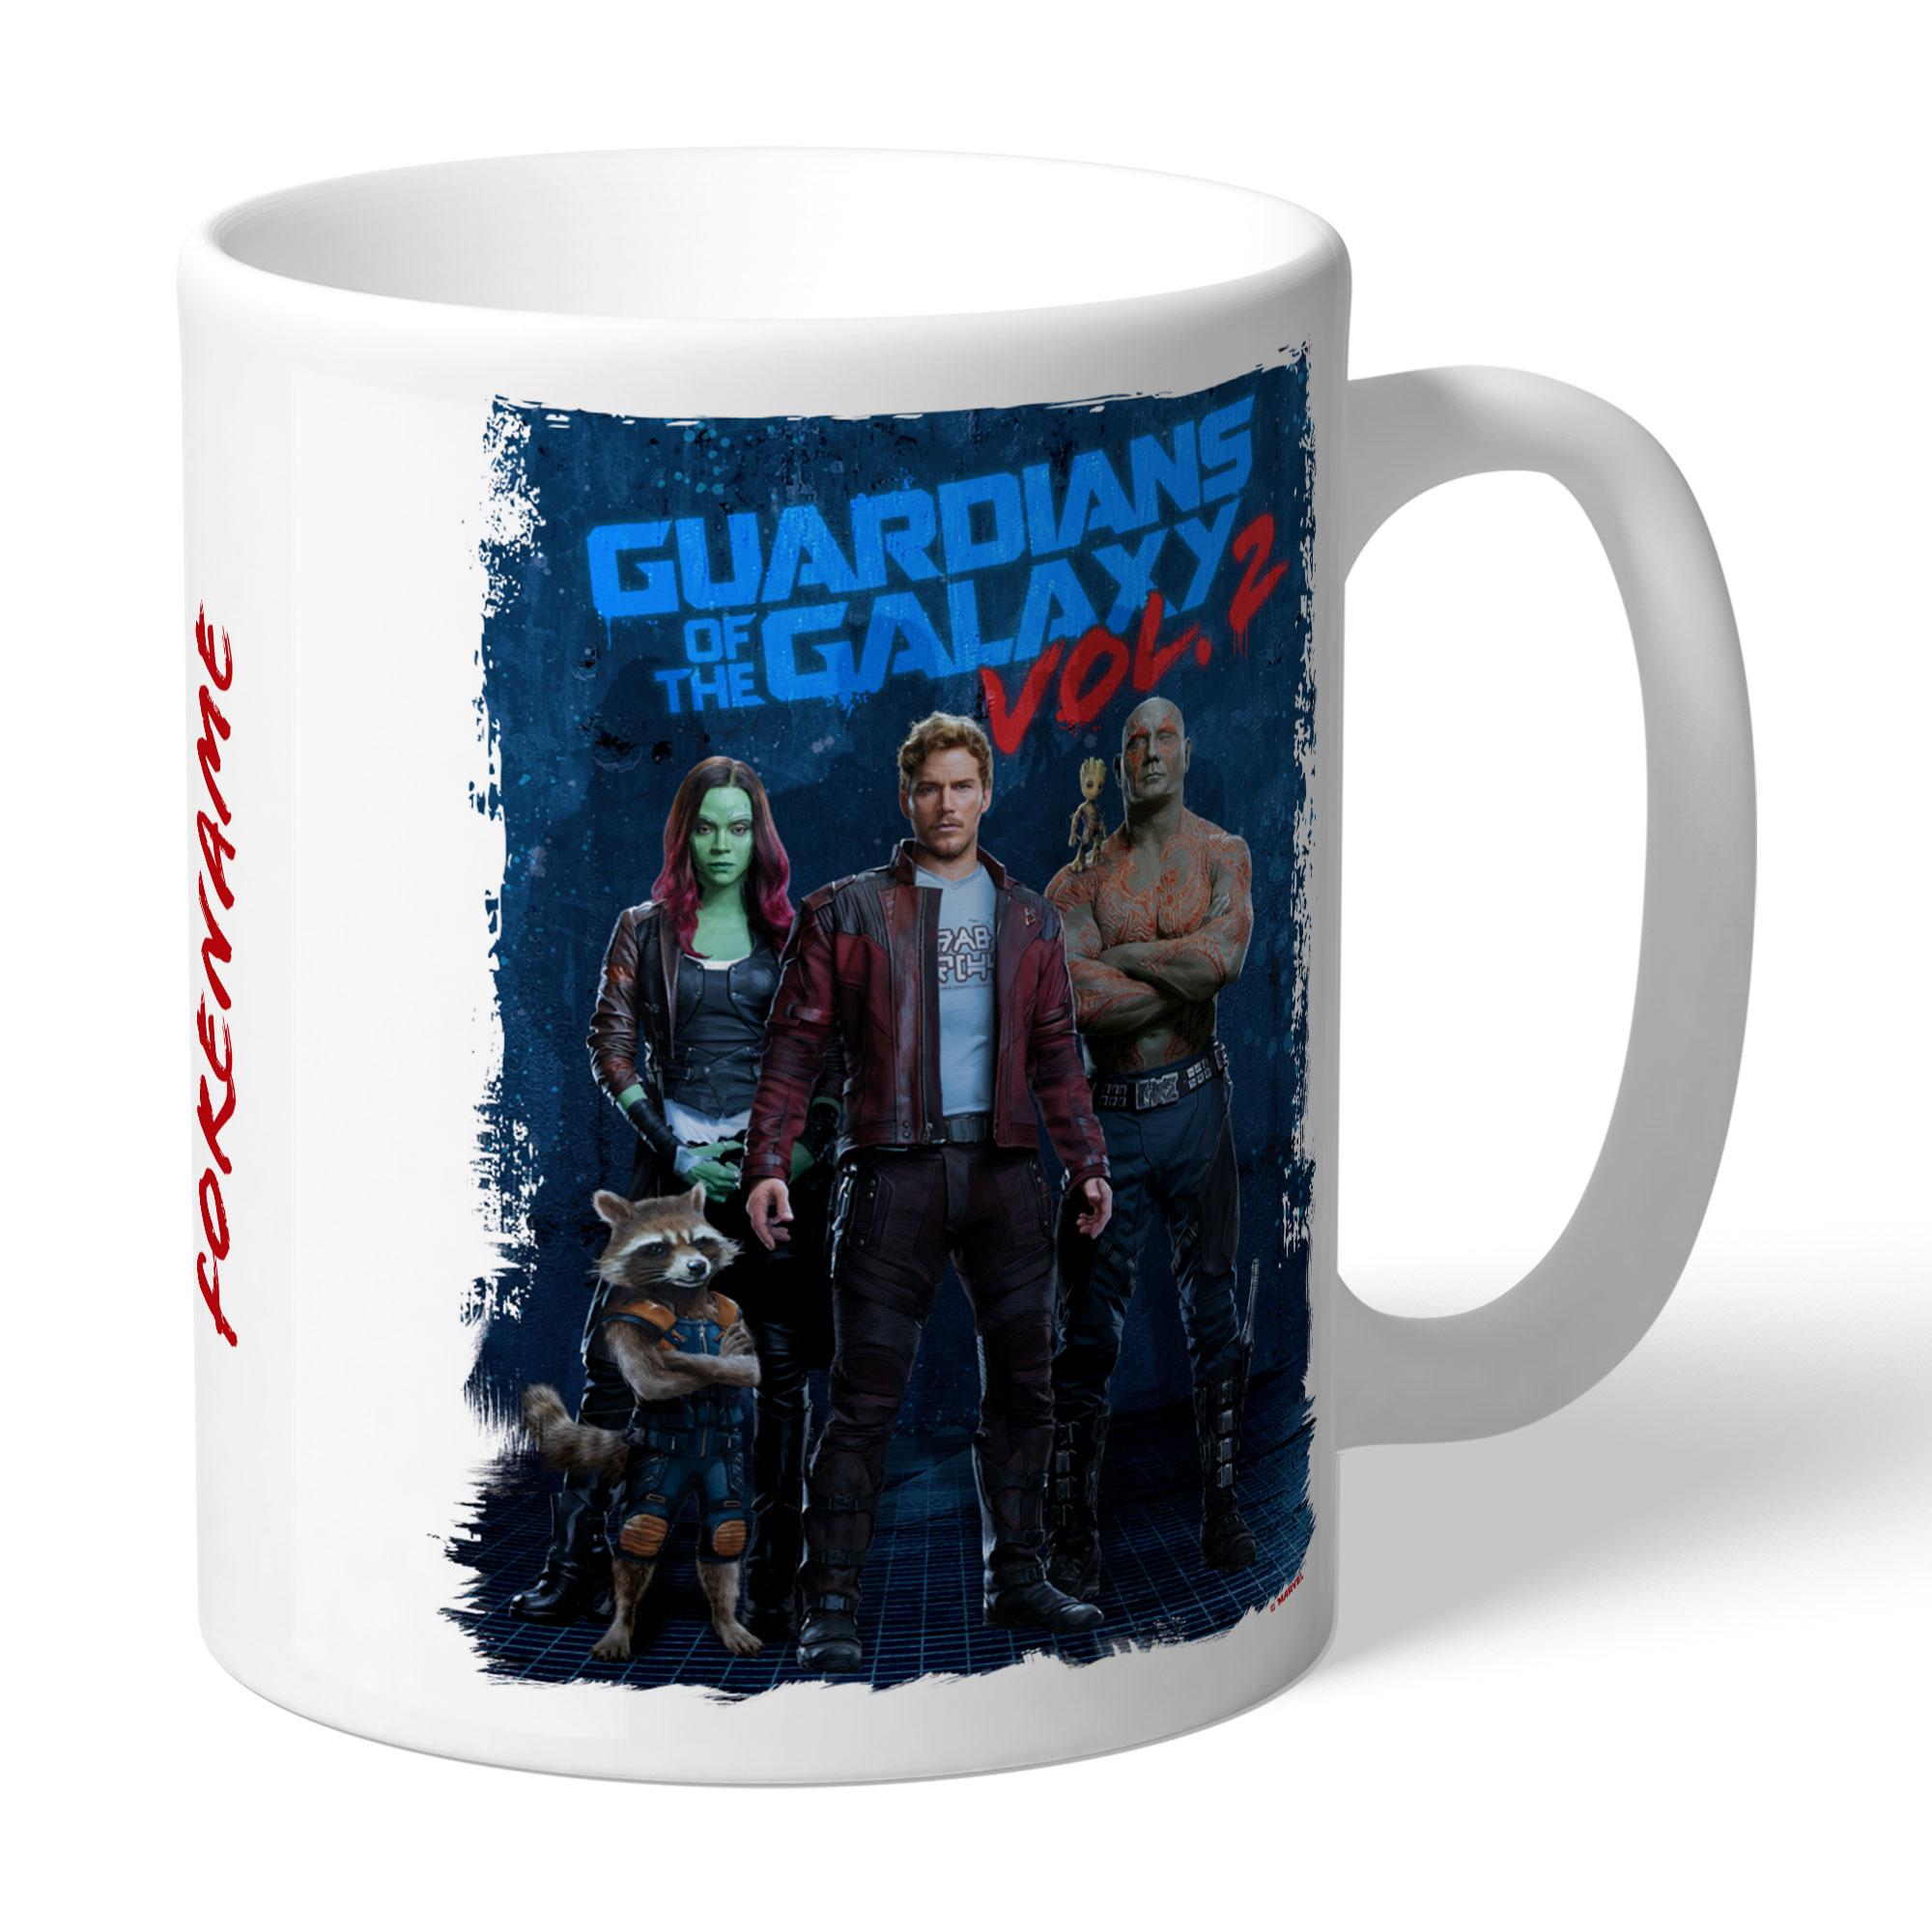 Marvel Guardians of the Galaxy Grunge Mug